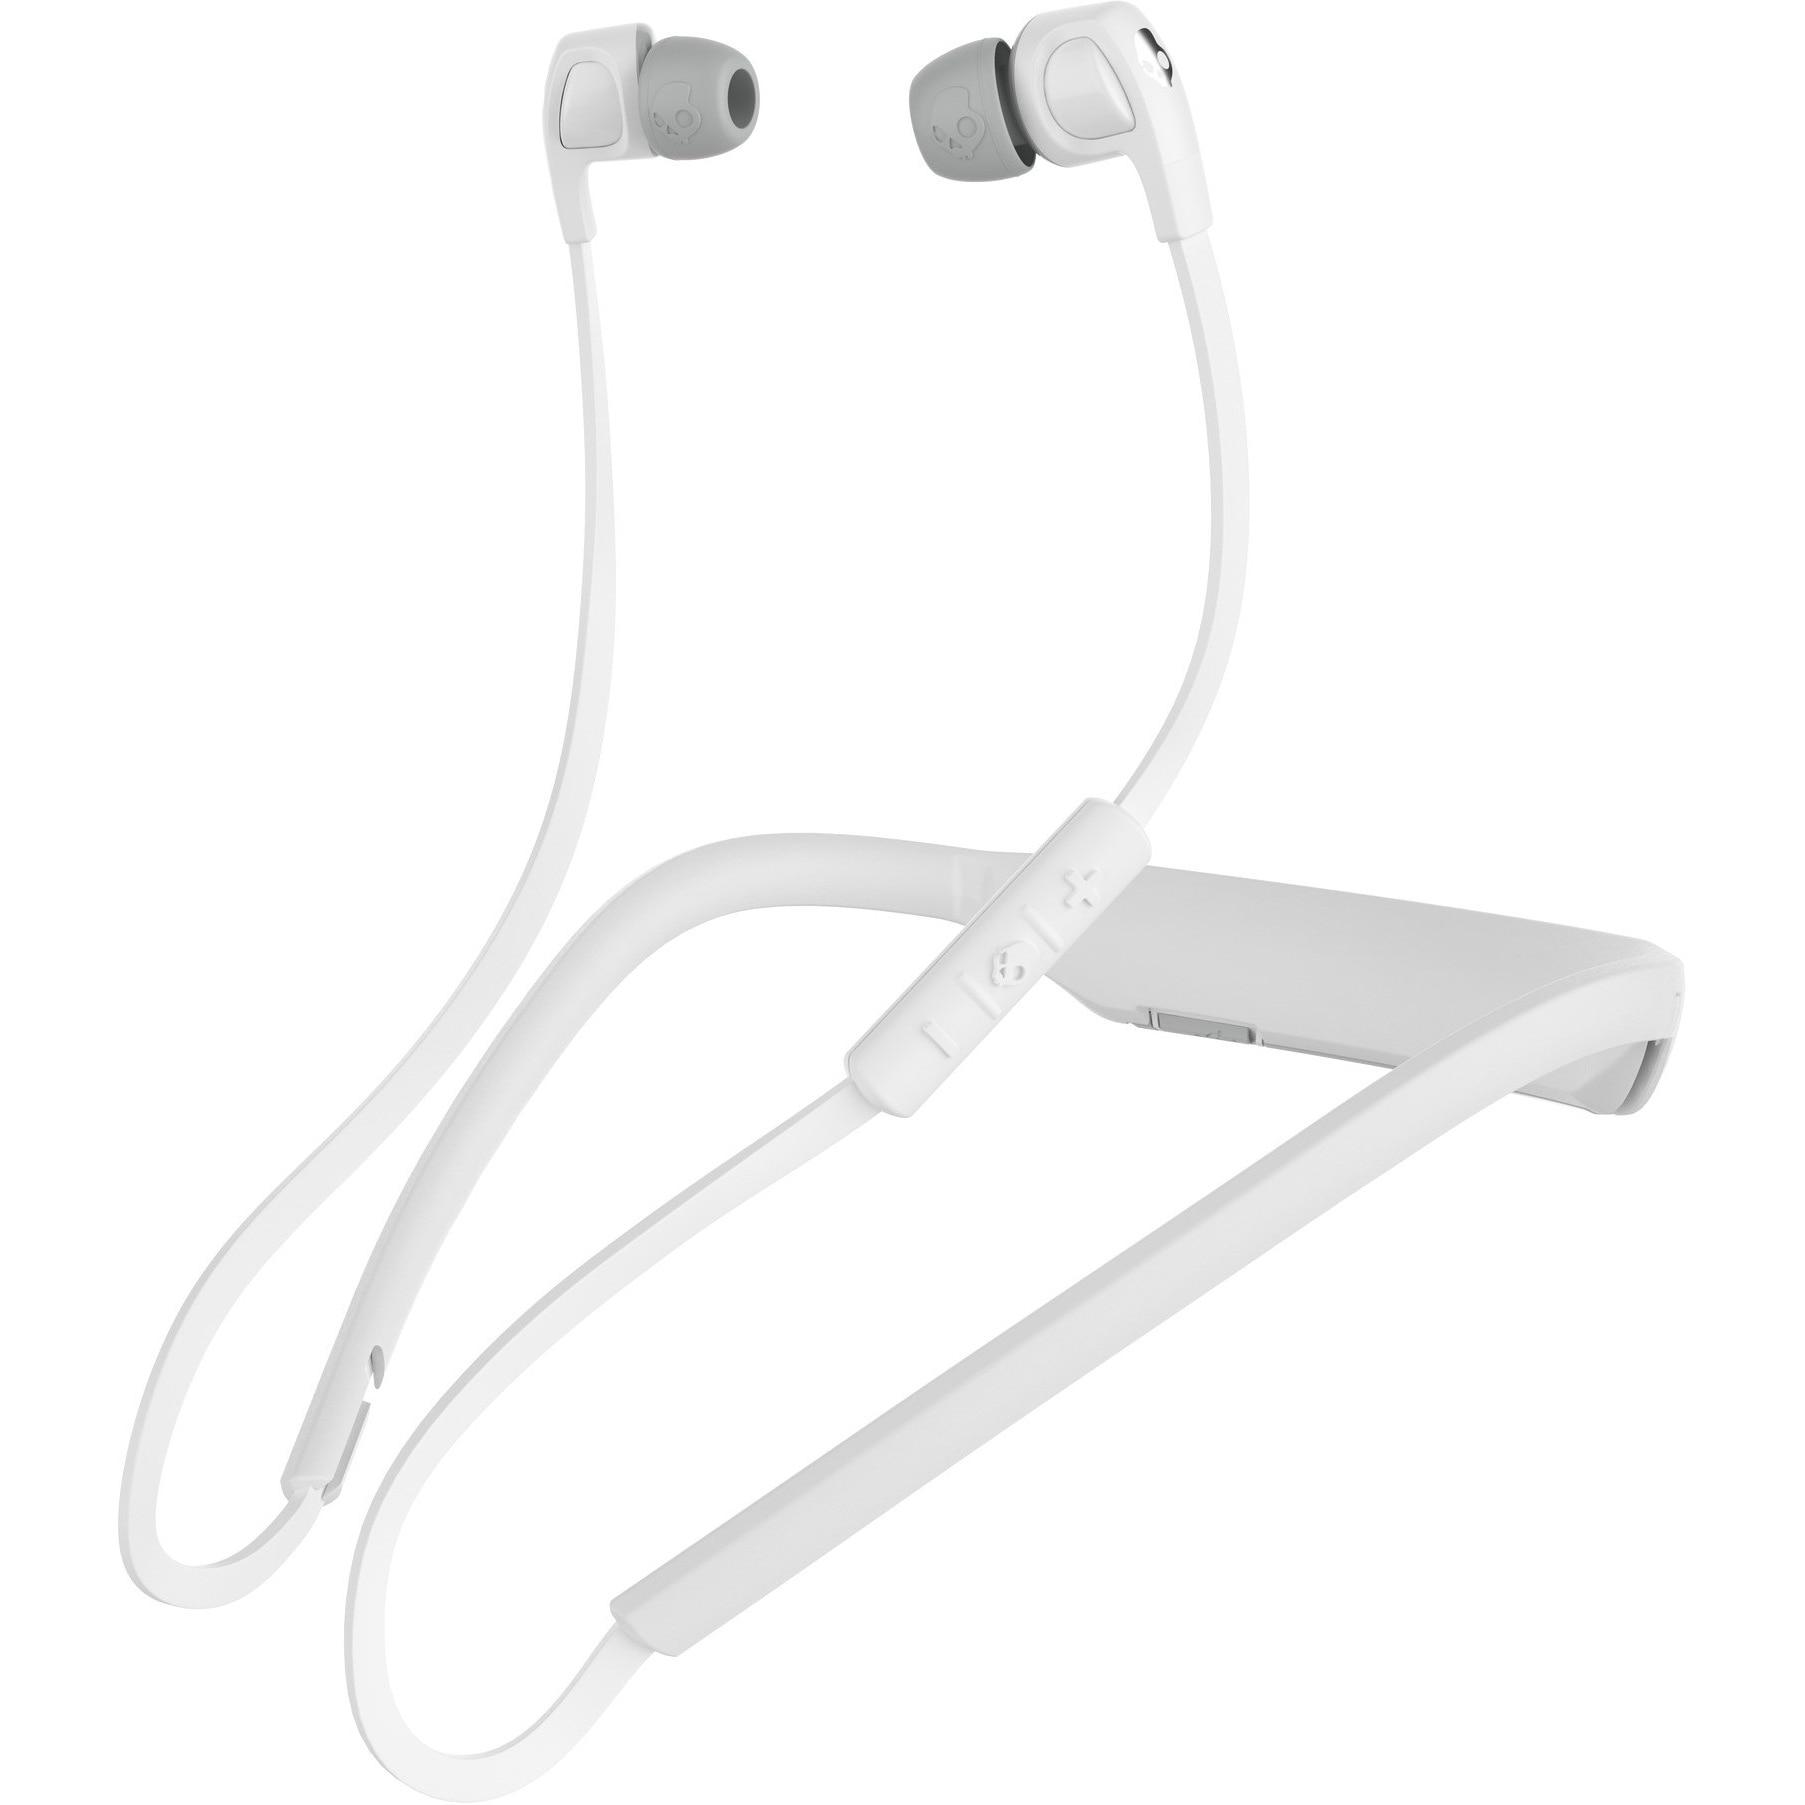 Fotografie Casti Audio In ear Skullcandy Buds 2 Wireless, Bluetooth, Functie Bass, Microfon, Autonomie 7 ore, White